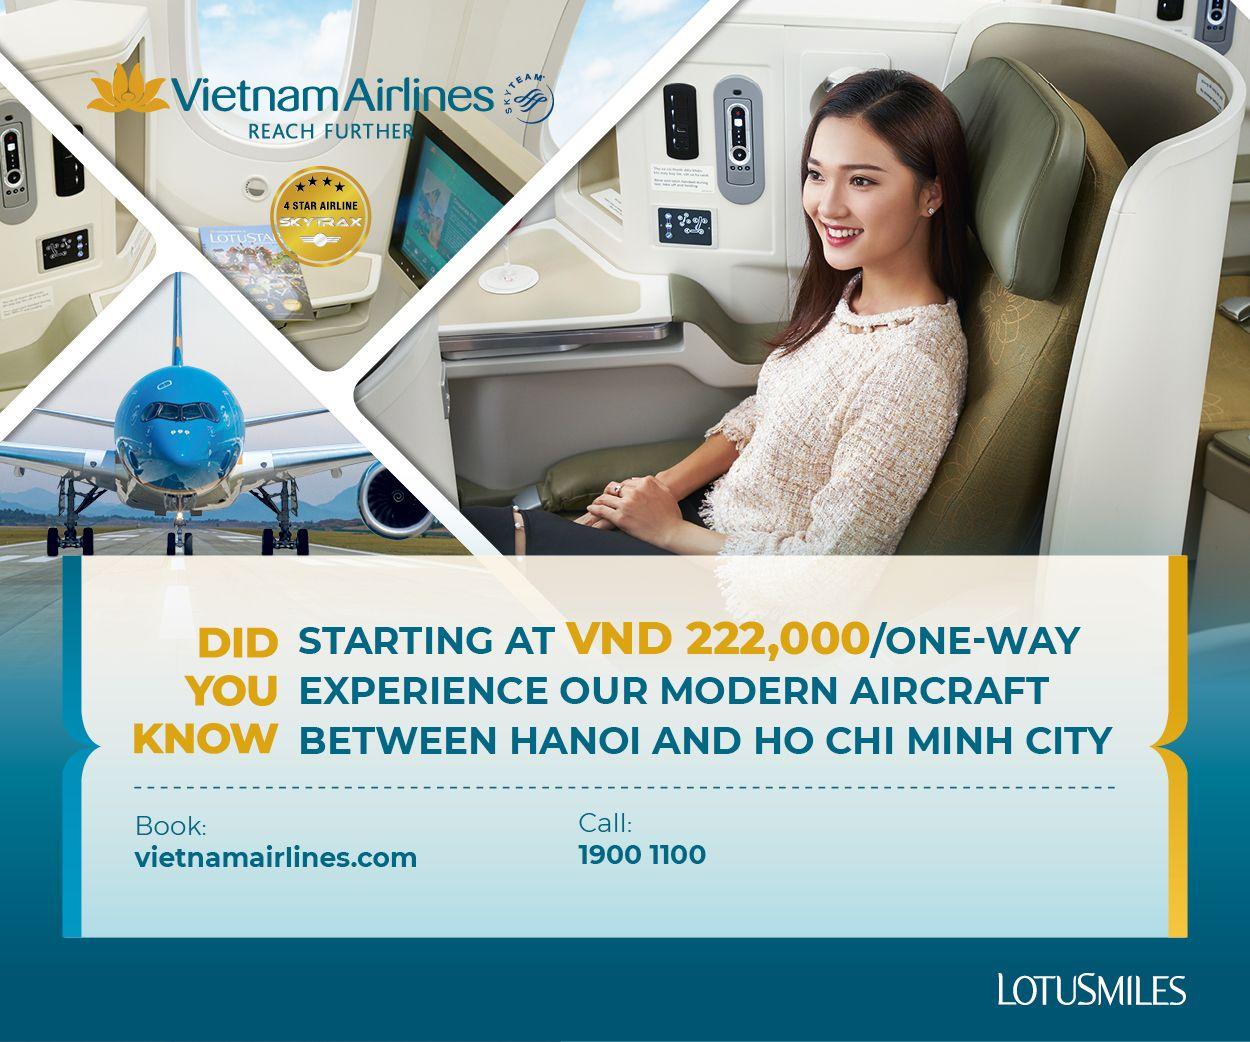 https://www.vietnamairlines.com/en/sites/tau-than-rong-han-sgn